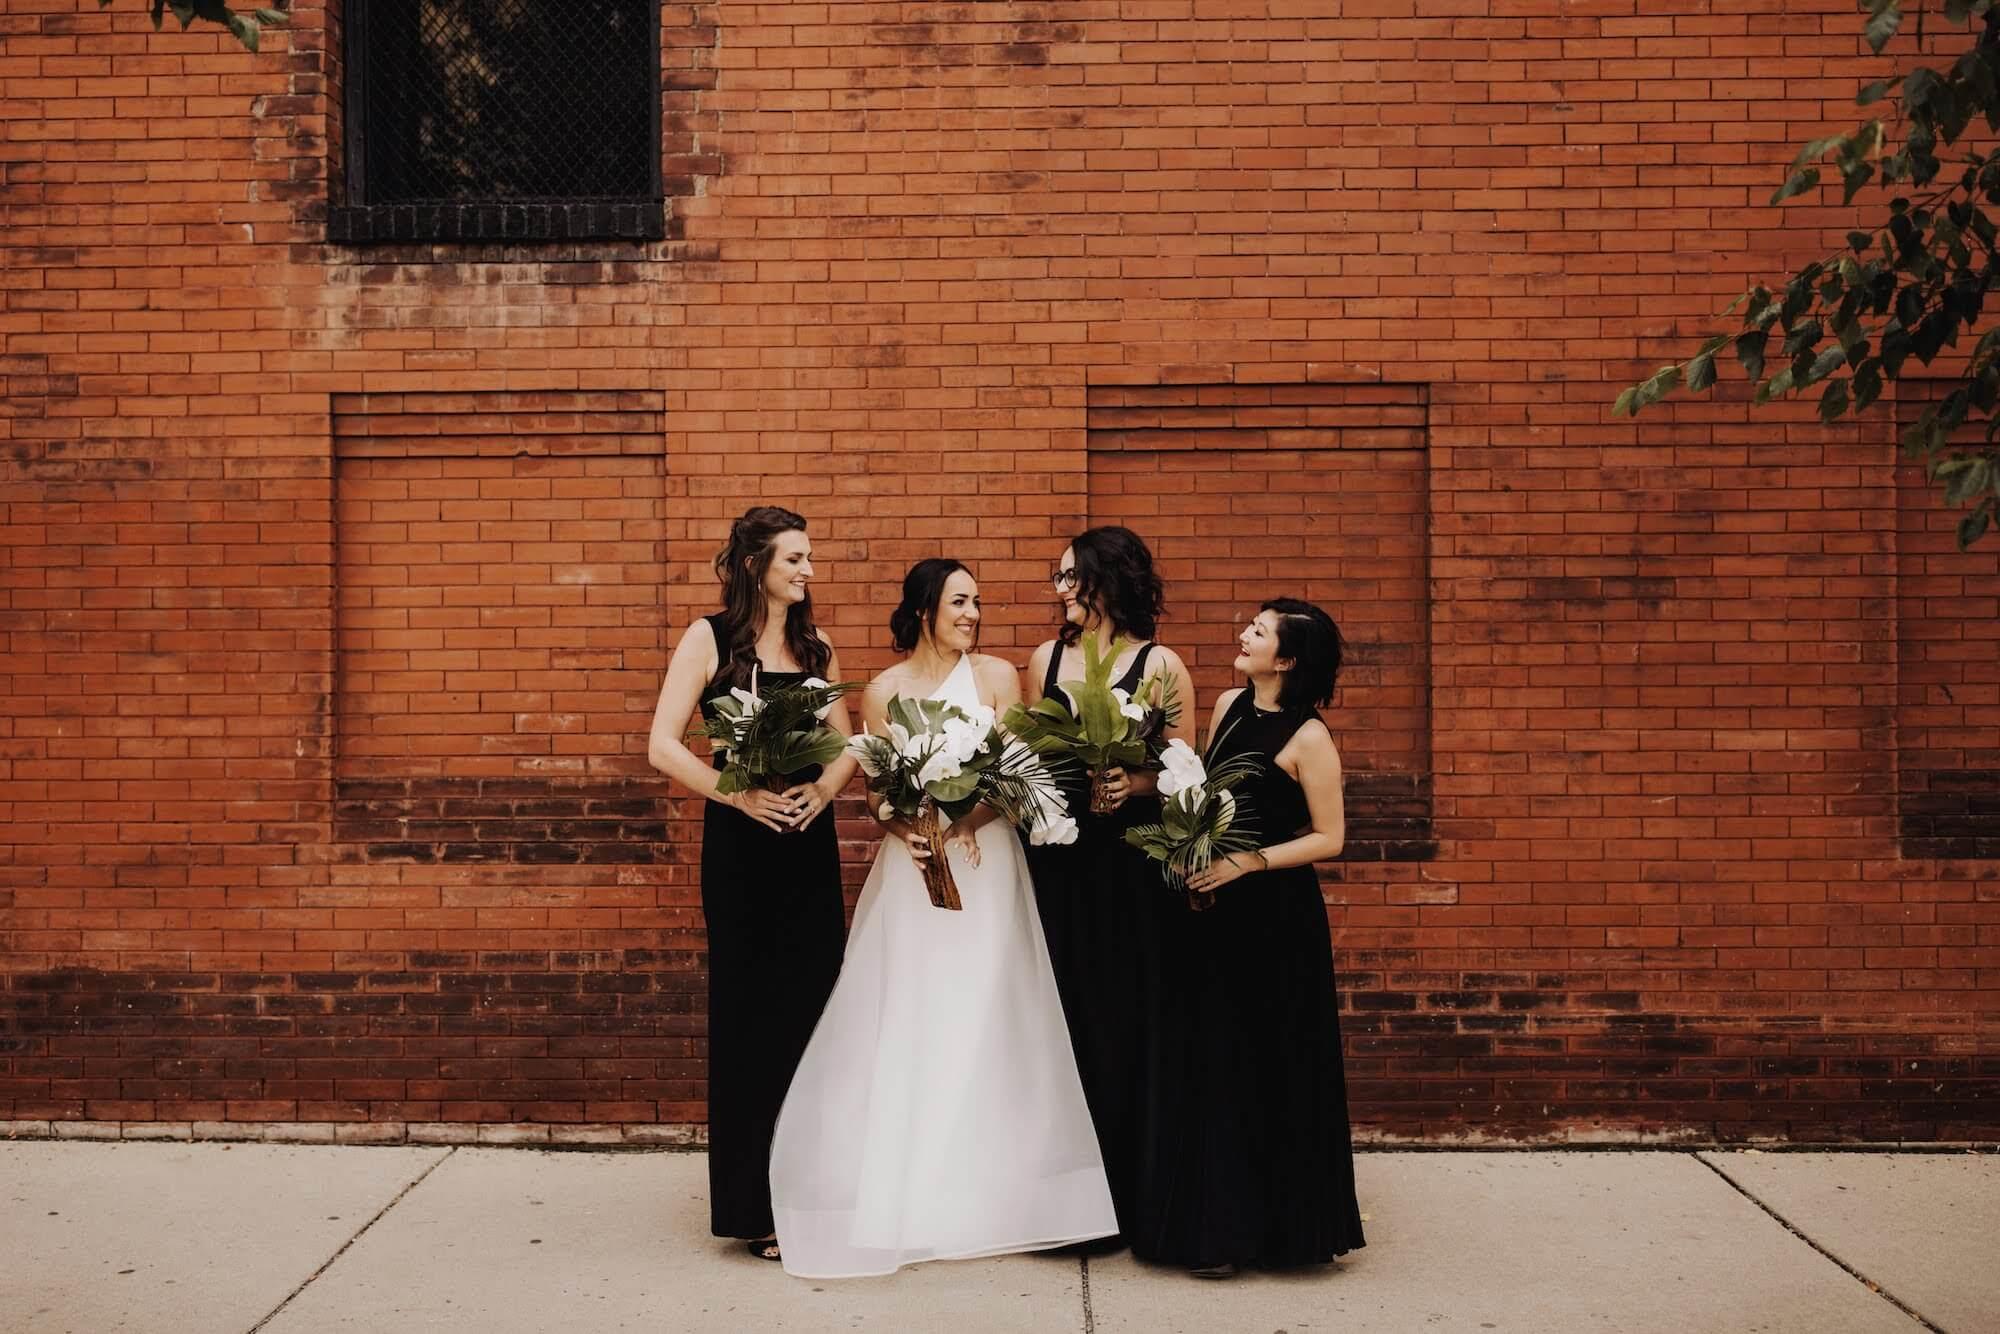 engle-olson-video-matt-lien-photography-rita-evan-wedding-21.jpg